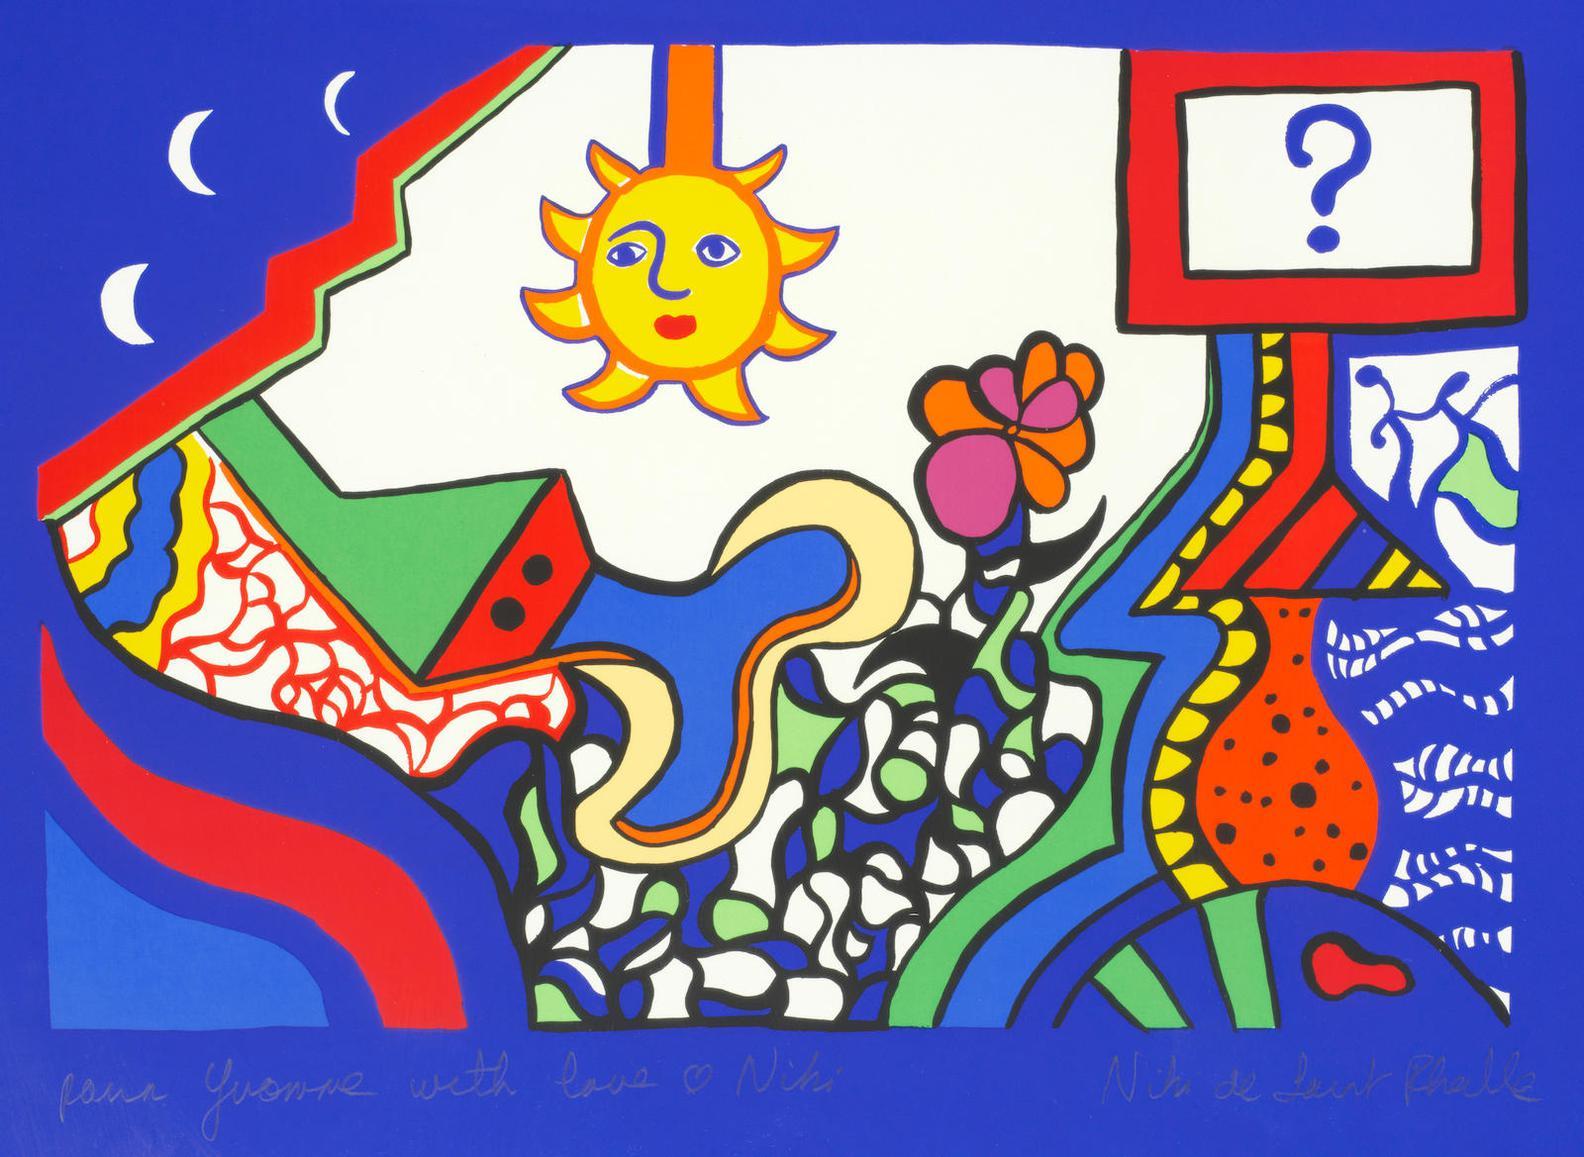 Niki de Saint Phalle-A Collection Of Four Prints: La Question, Carte No. XVII, Borrego Desert, Samson and Goliath-1988